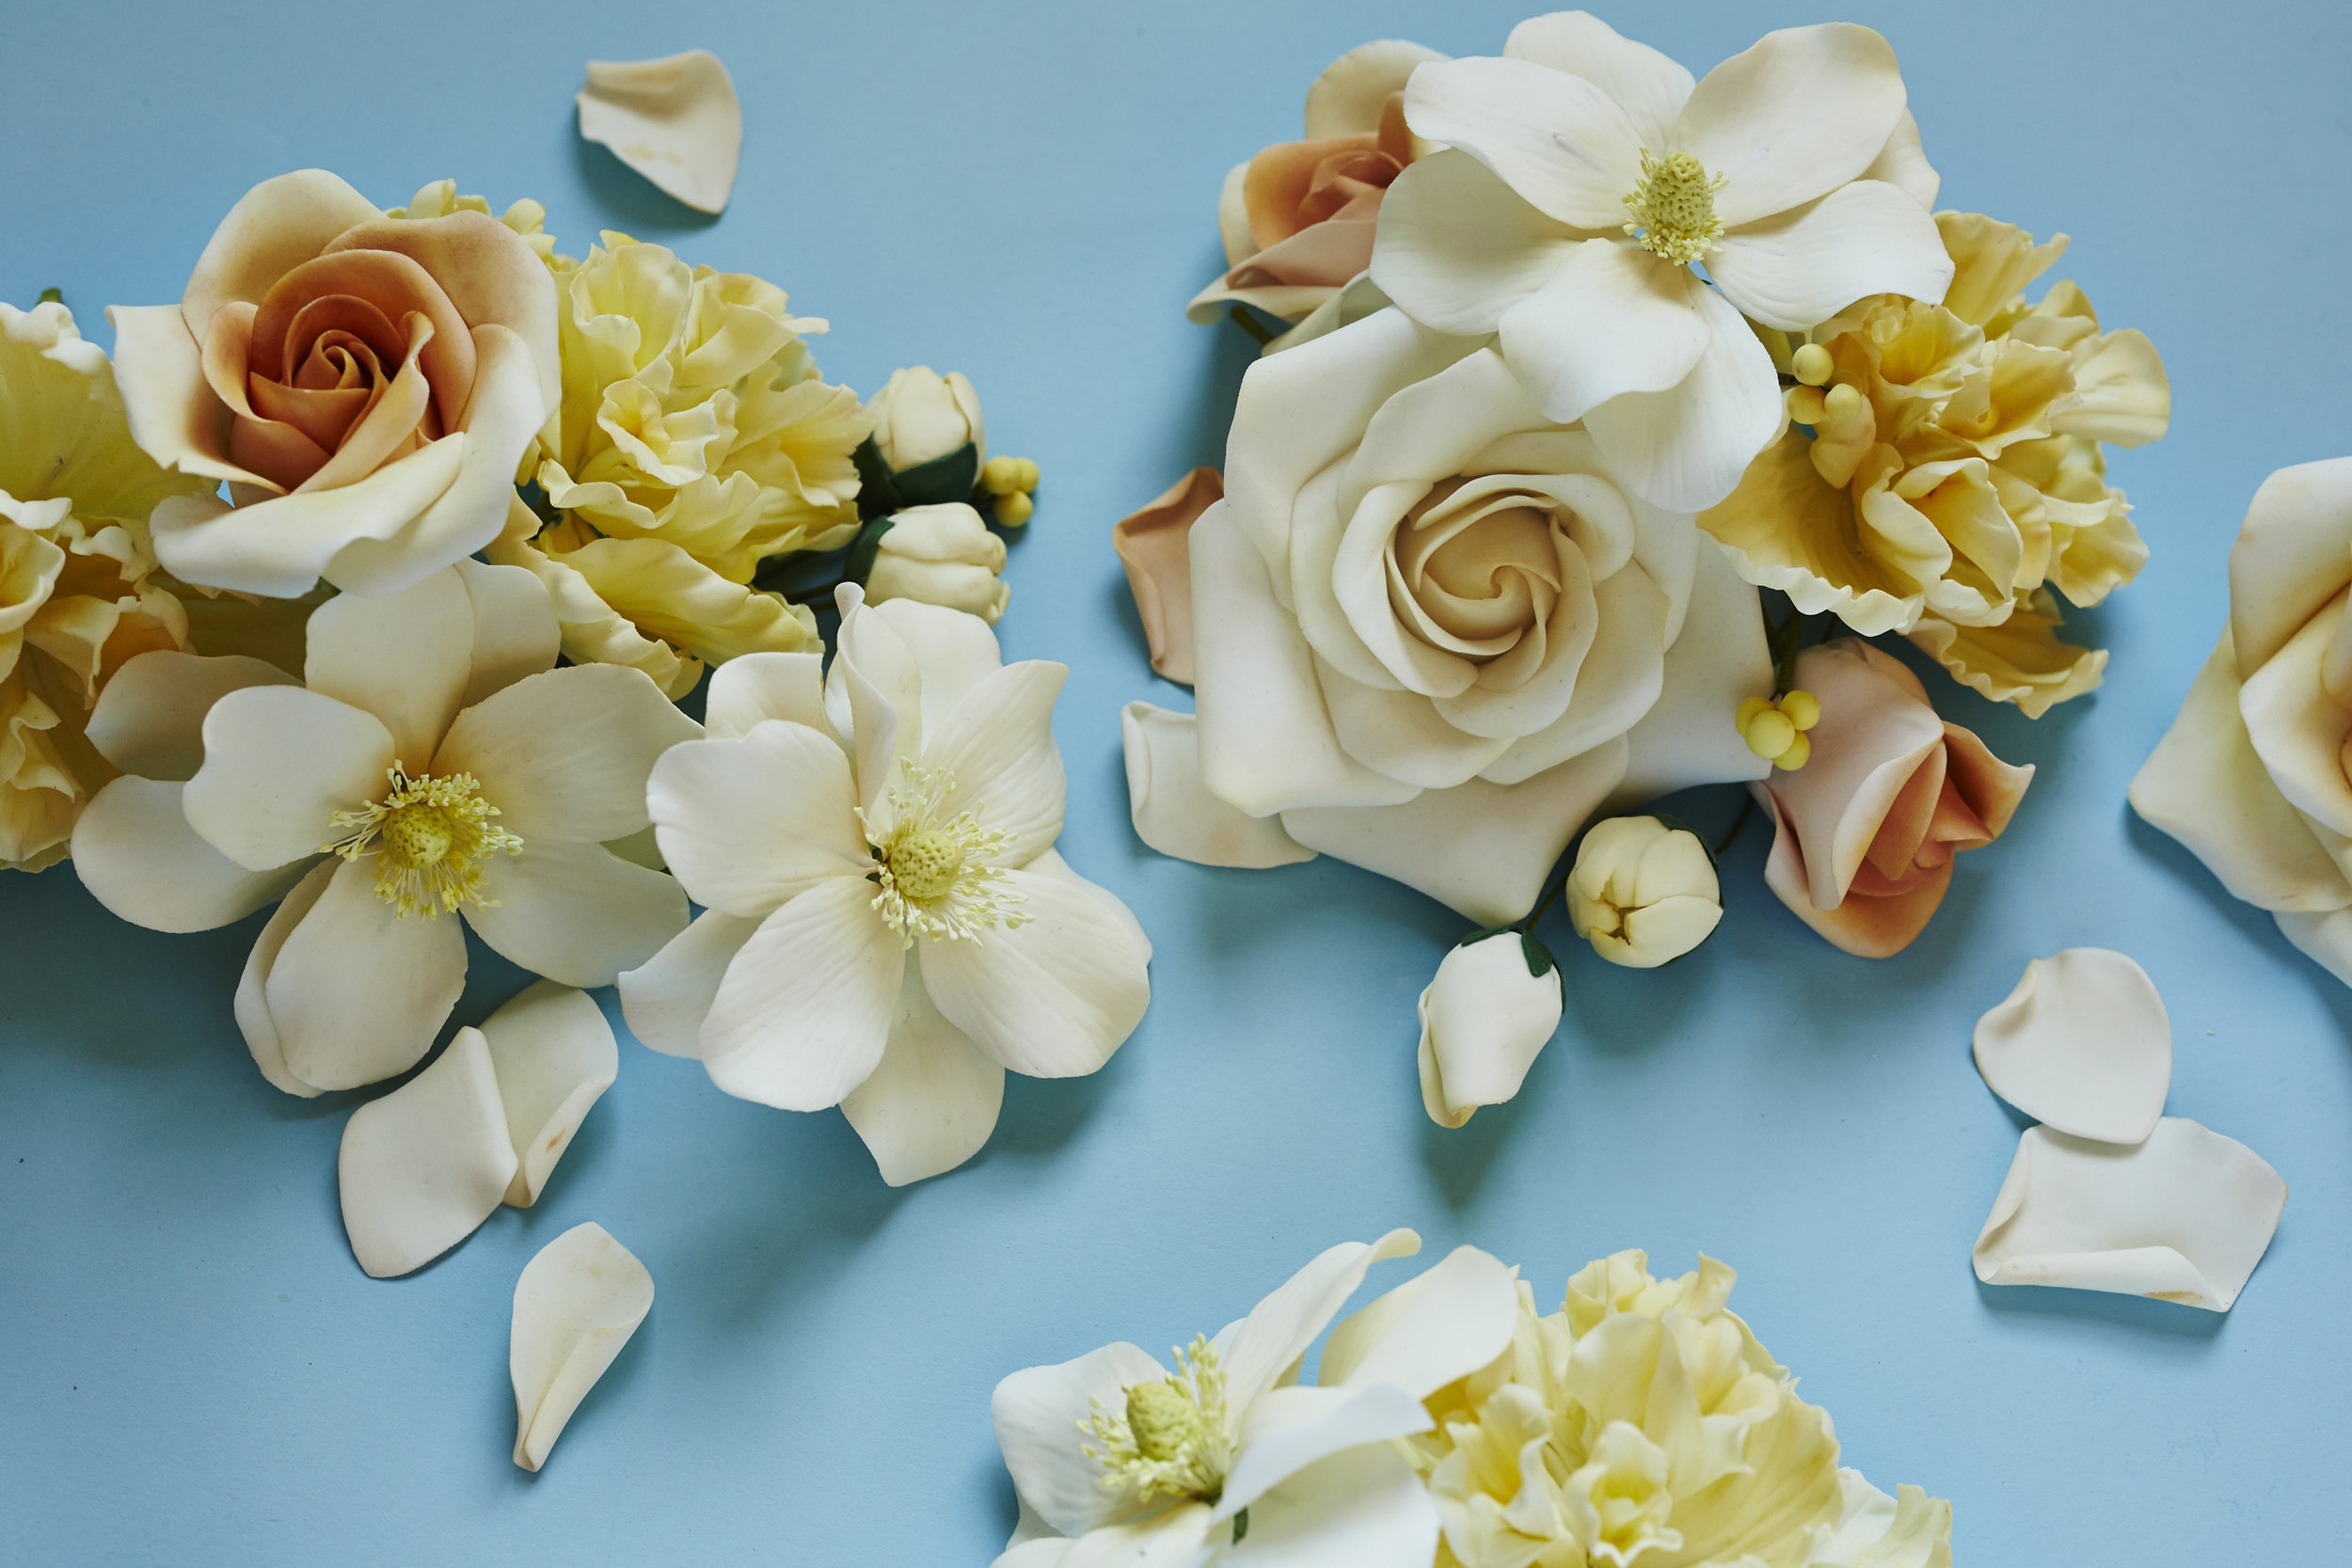 Gum Paste Flowers (Photo: Julia Gartland)